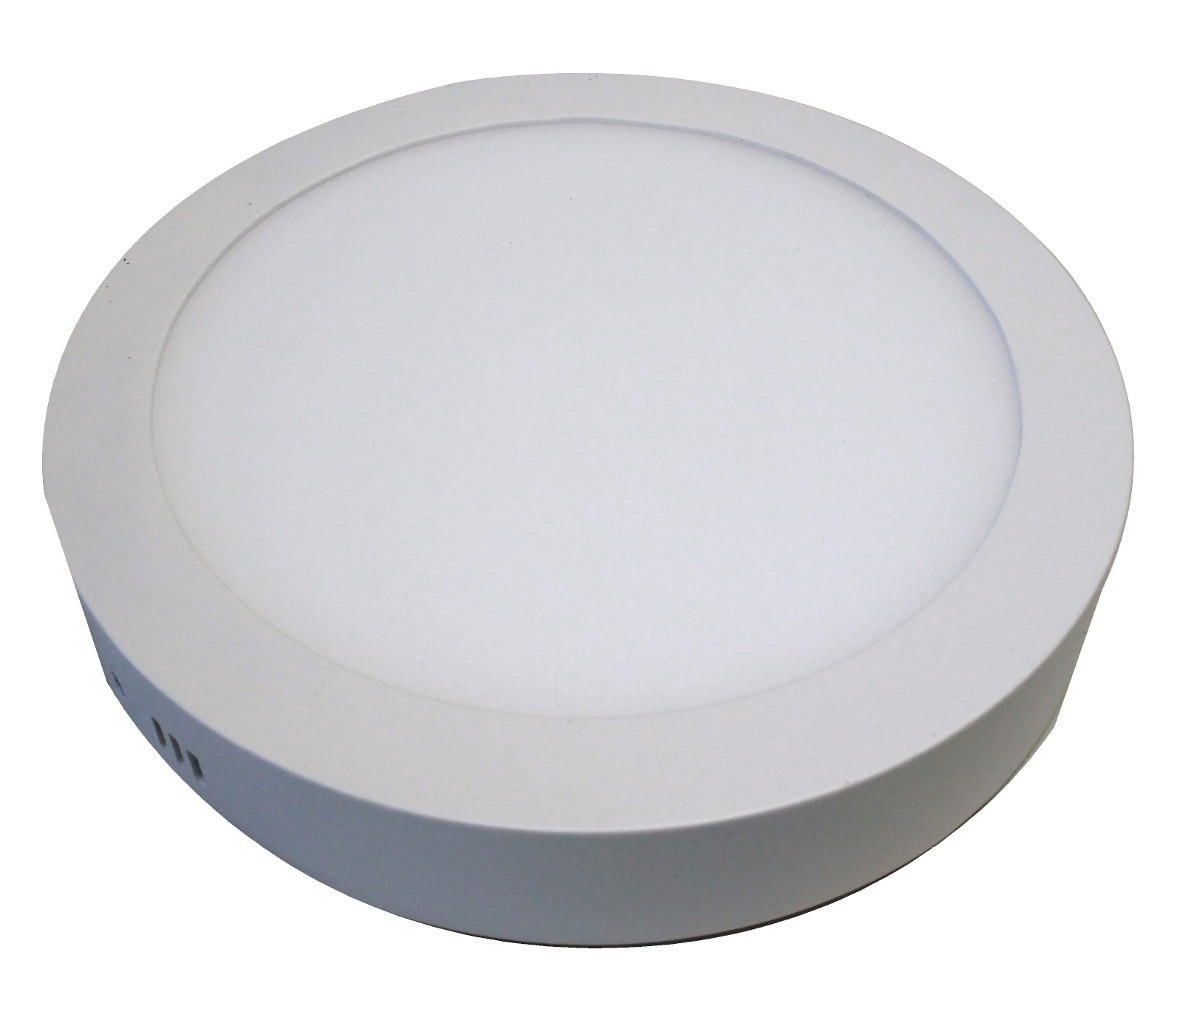 Painel Plafon Redondo Luminária Sobrepor Led 12w Bivolt Branco Quente - RPC-COMMERCE